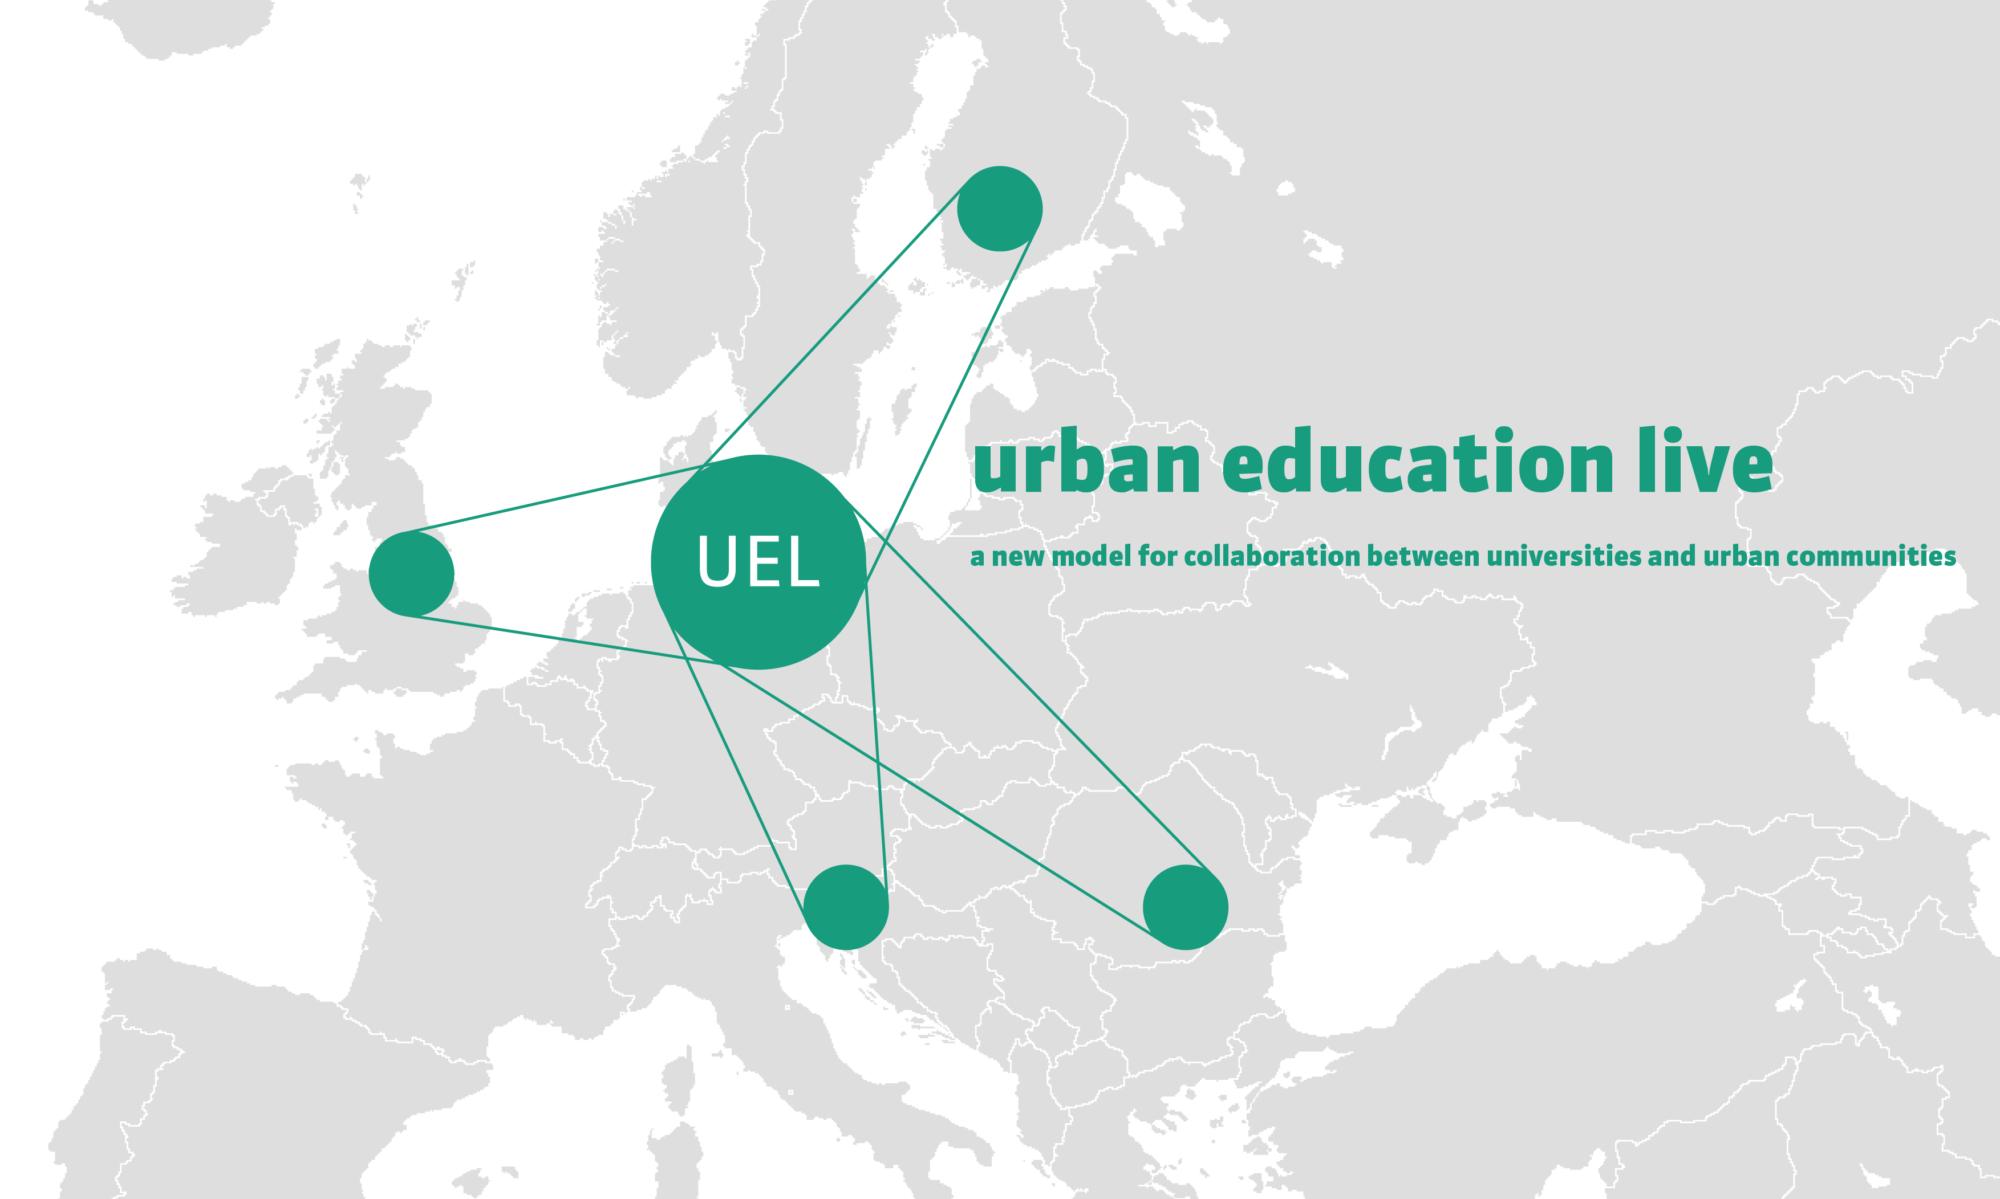 Urban Education Live